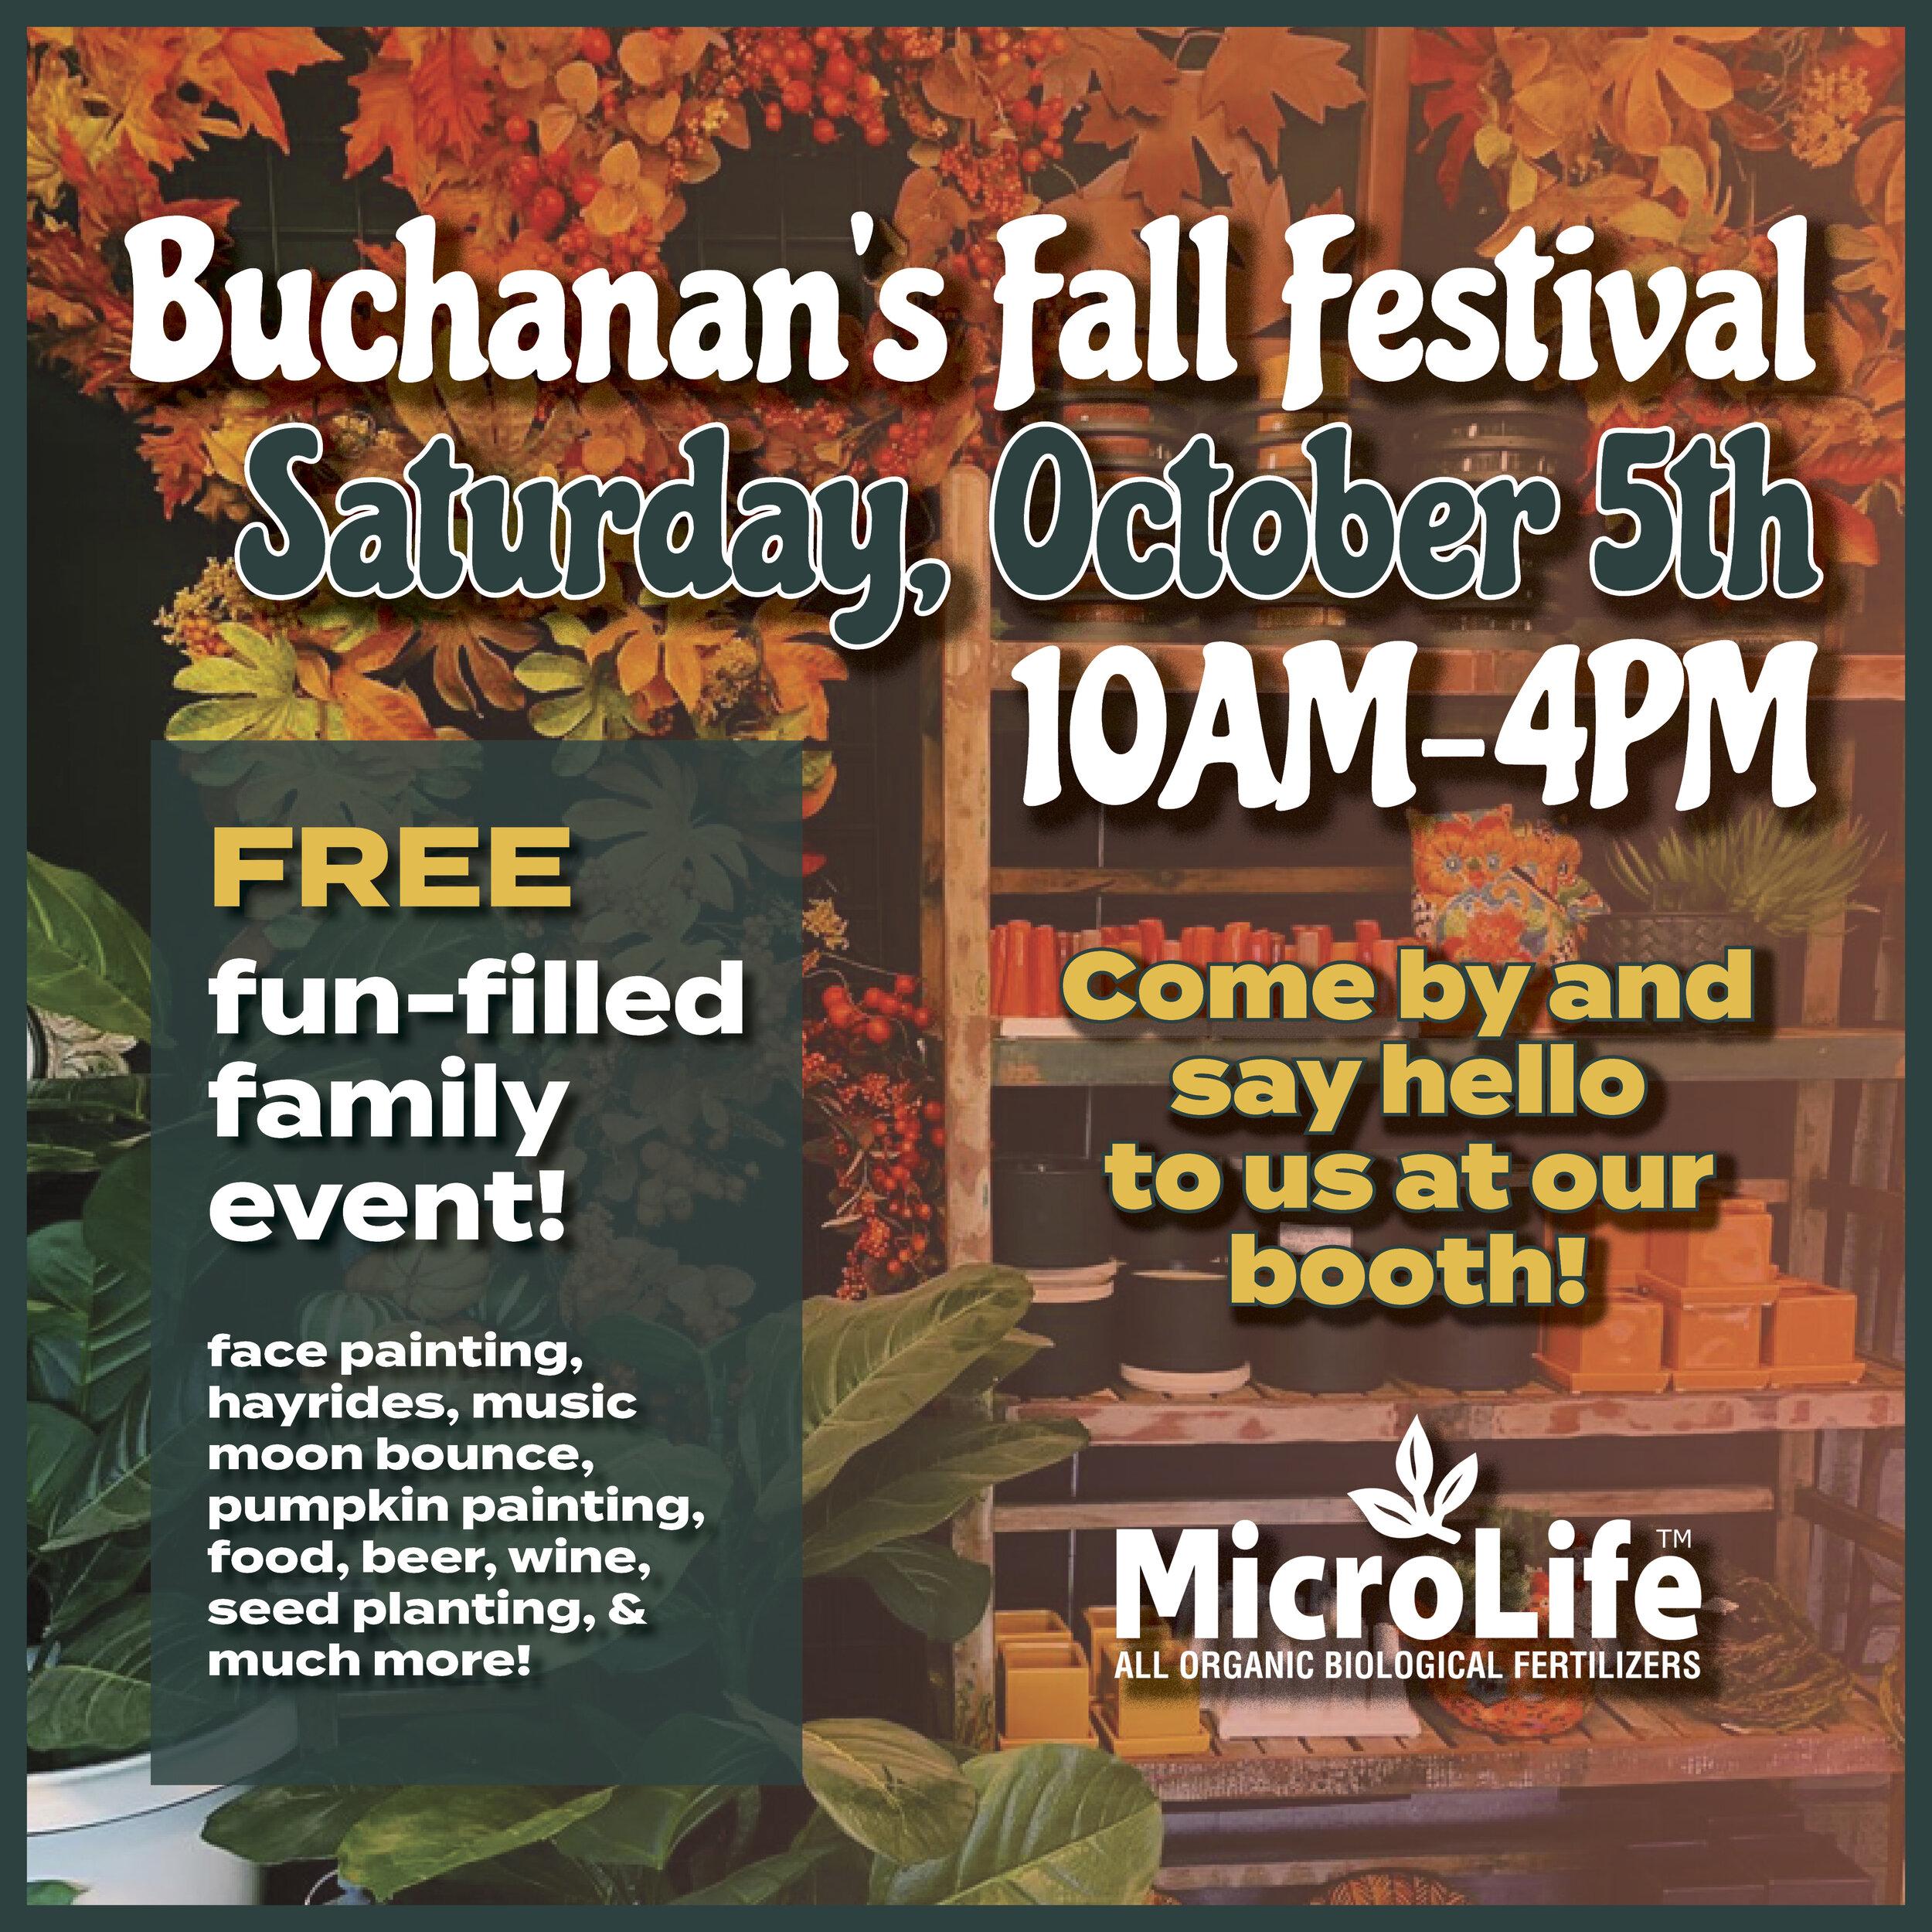 Buchanans Fall Fest Insta Graphic.jpg